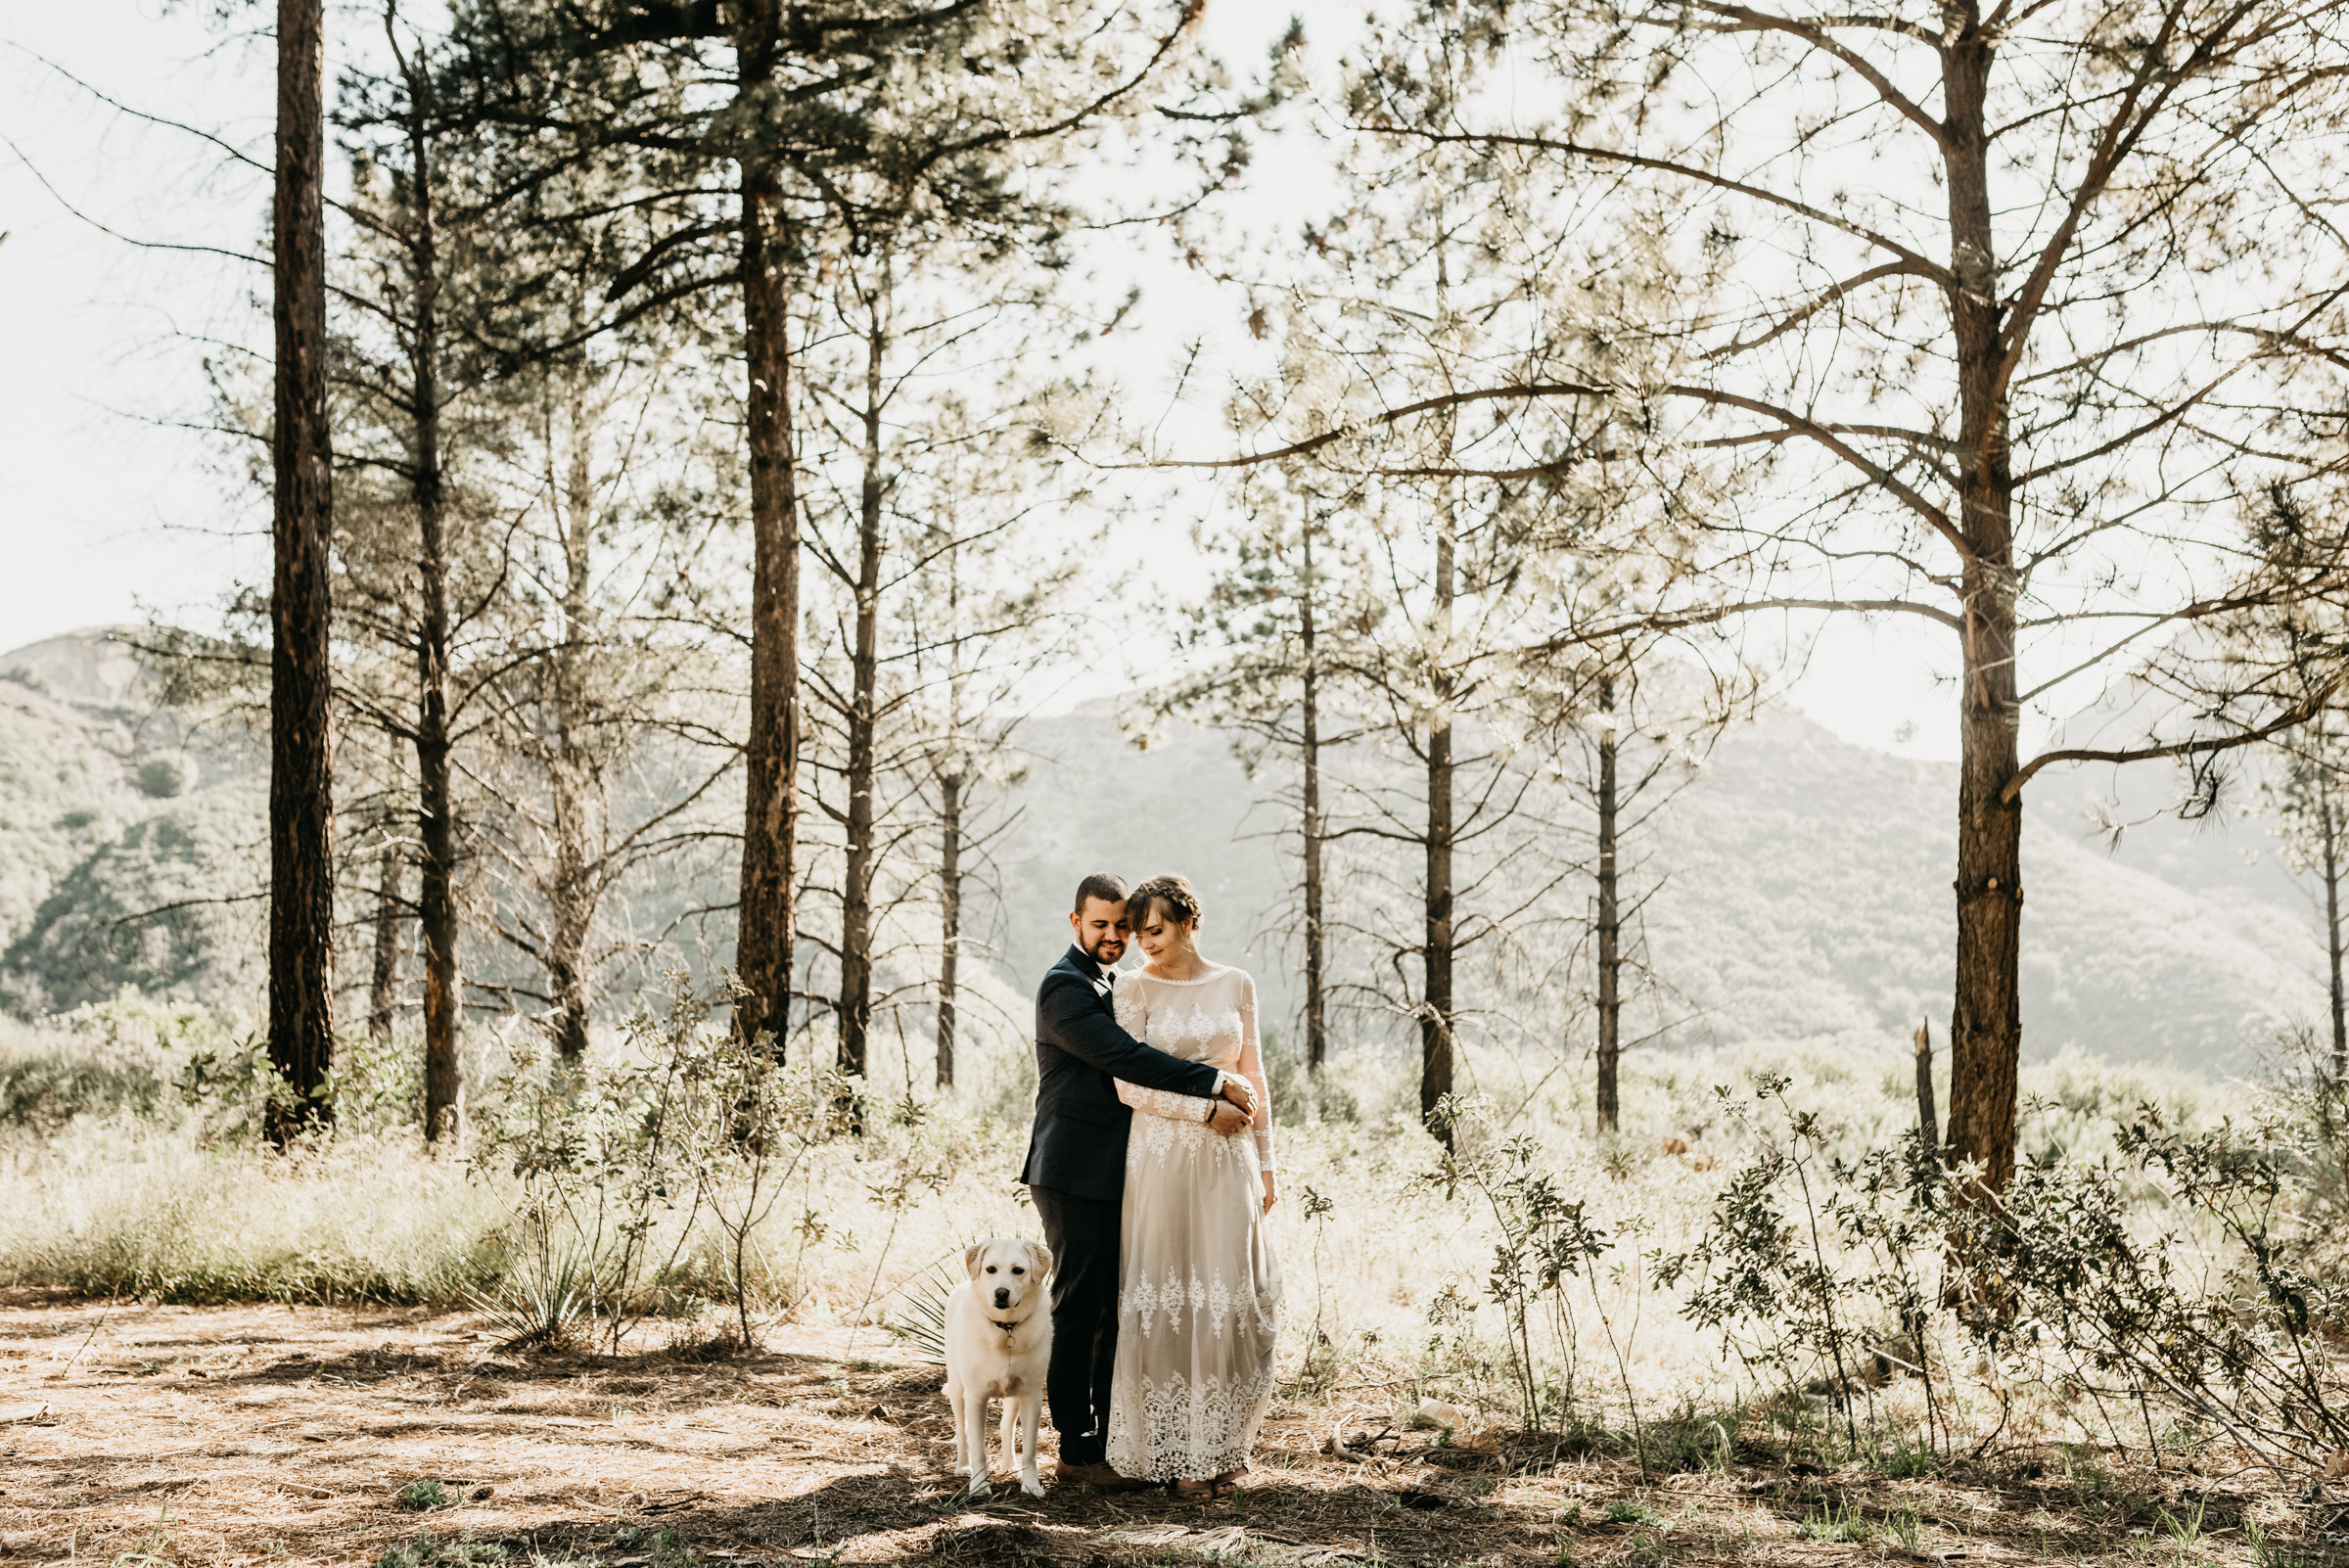 ©Isaiah + Taylor Photography - Los Angeles Wedding Photographers - Los Angeles Forest Wedding -15.jpg